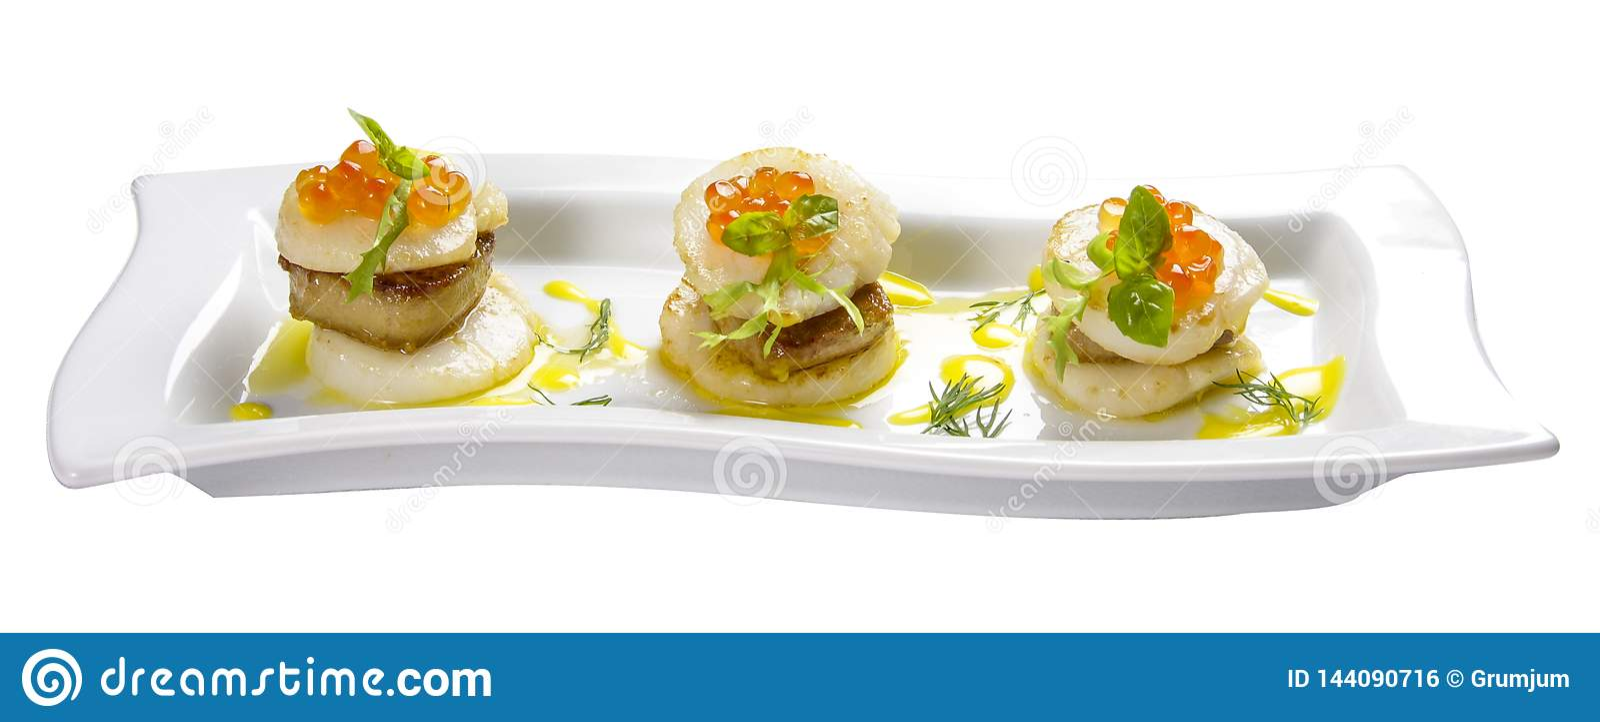 Scallop with foie gras